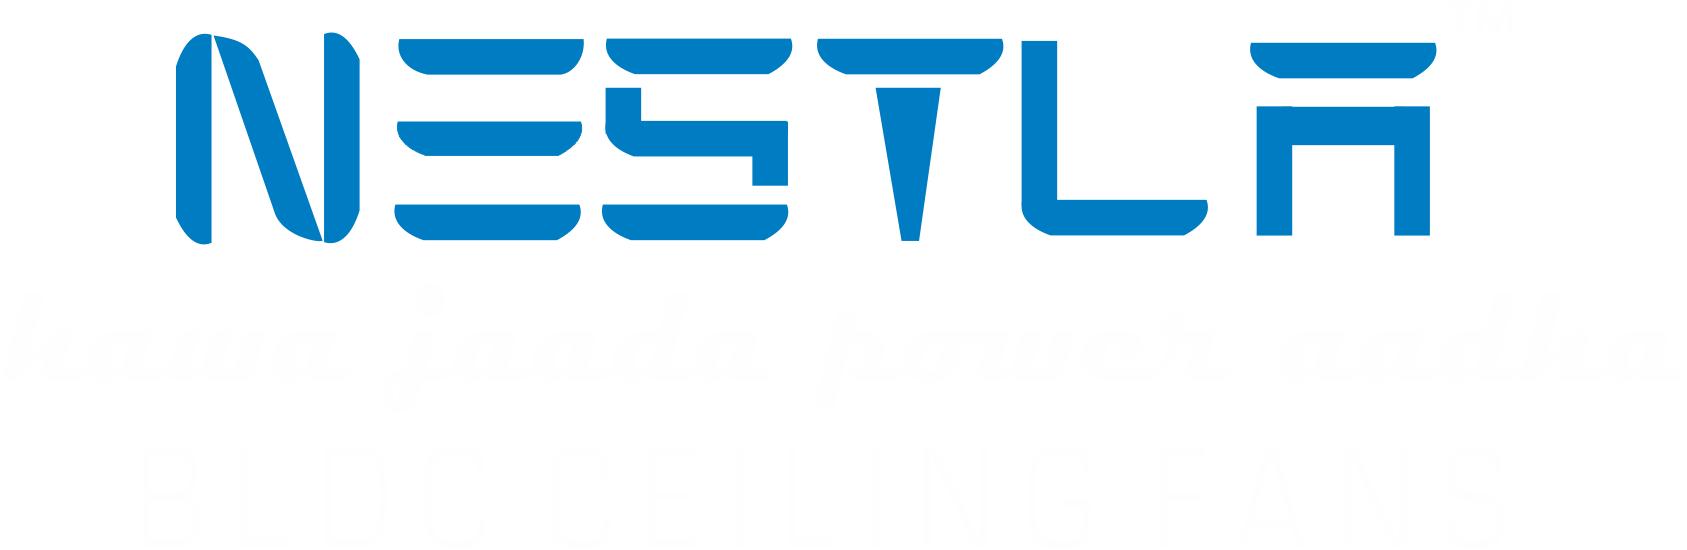 Nestla Fans